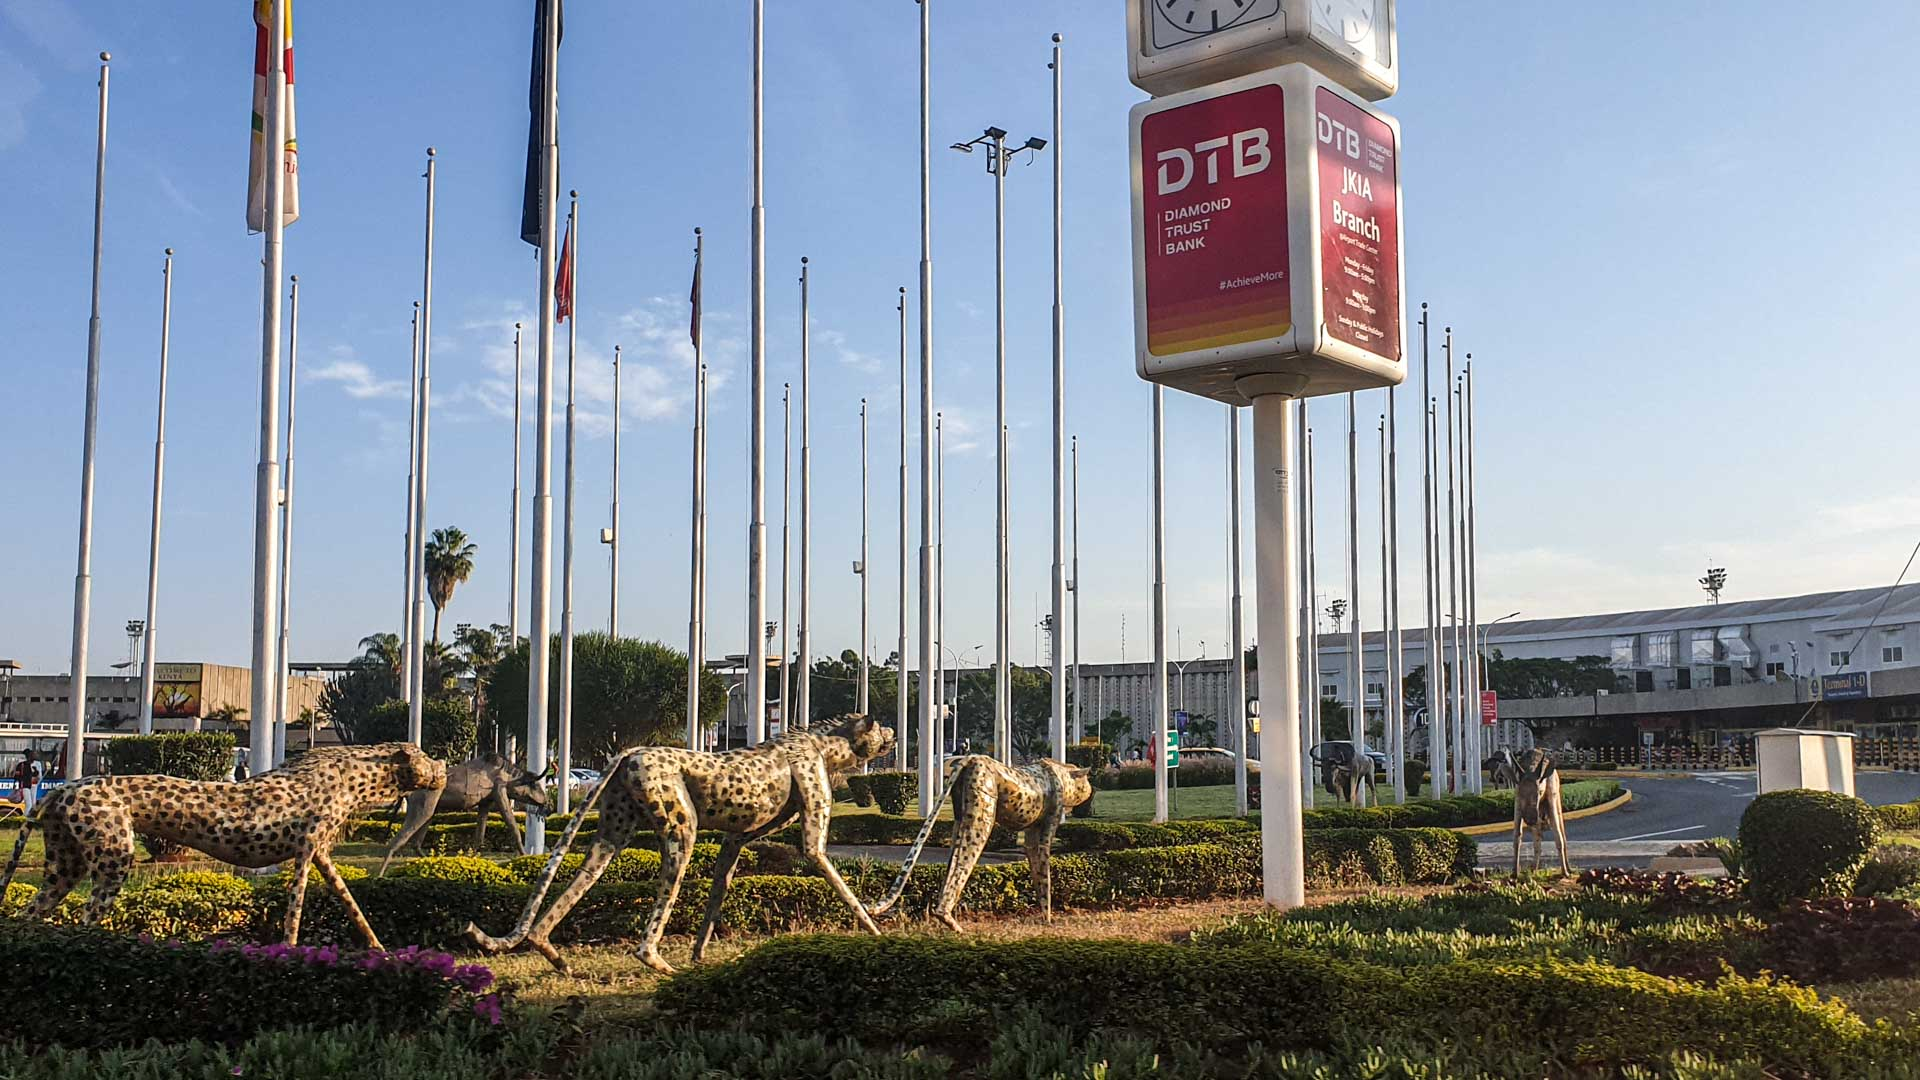 Guepardos en el Aeropuerto Internacional Jomo Kenyatta, Nairobi, Kenia